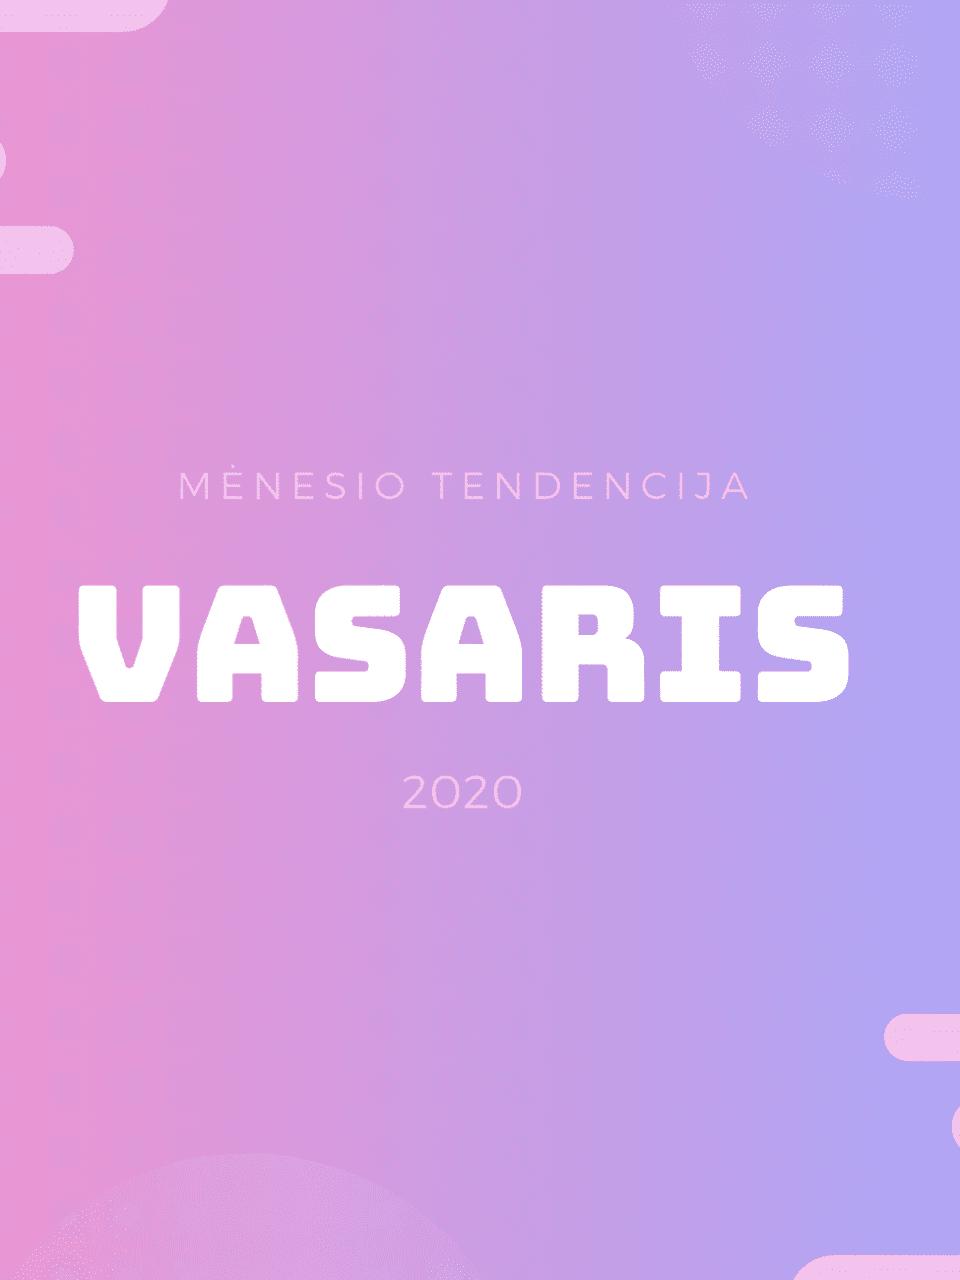 https://zachh.lt/wp-content/uploads/2020/02/1600x1300-vasaris-960x1280.png